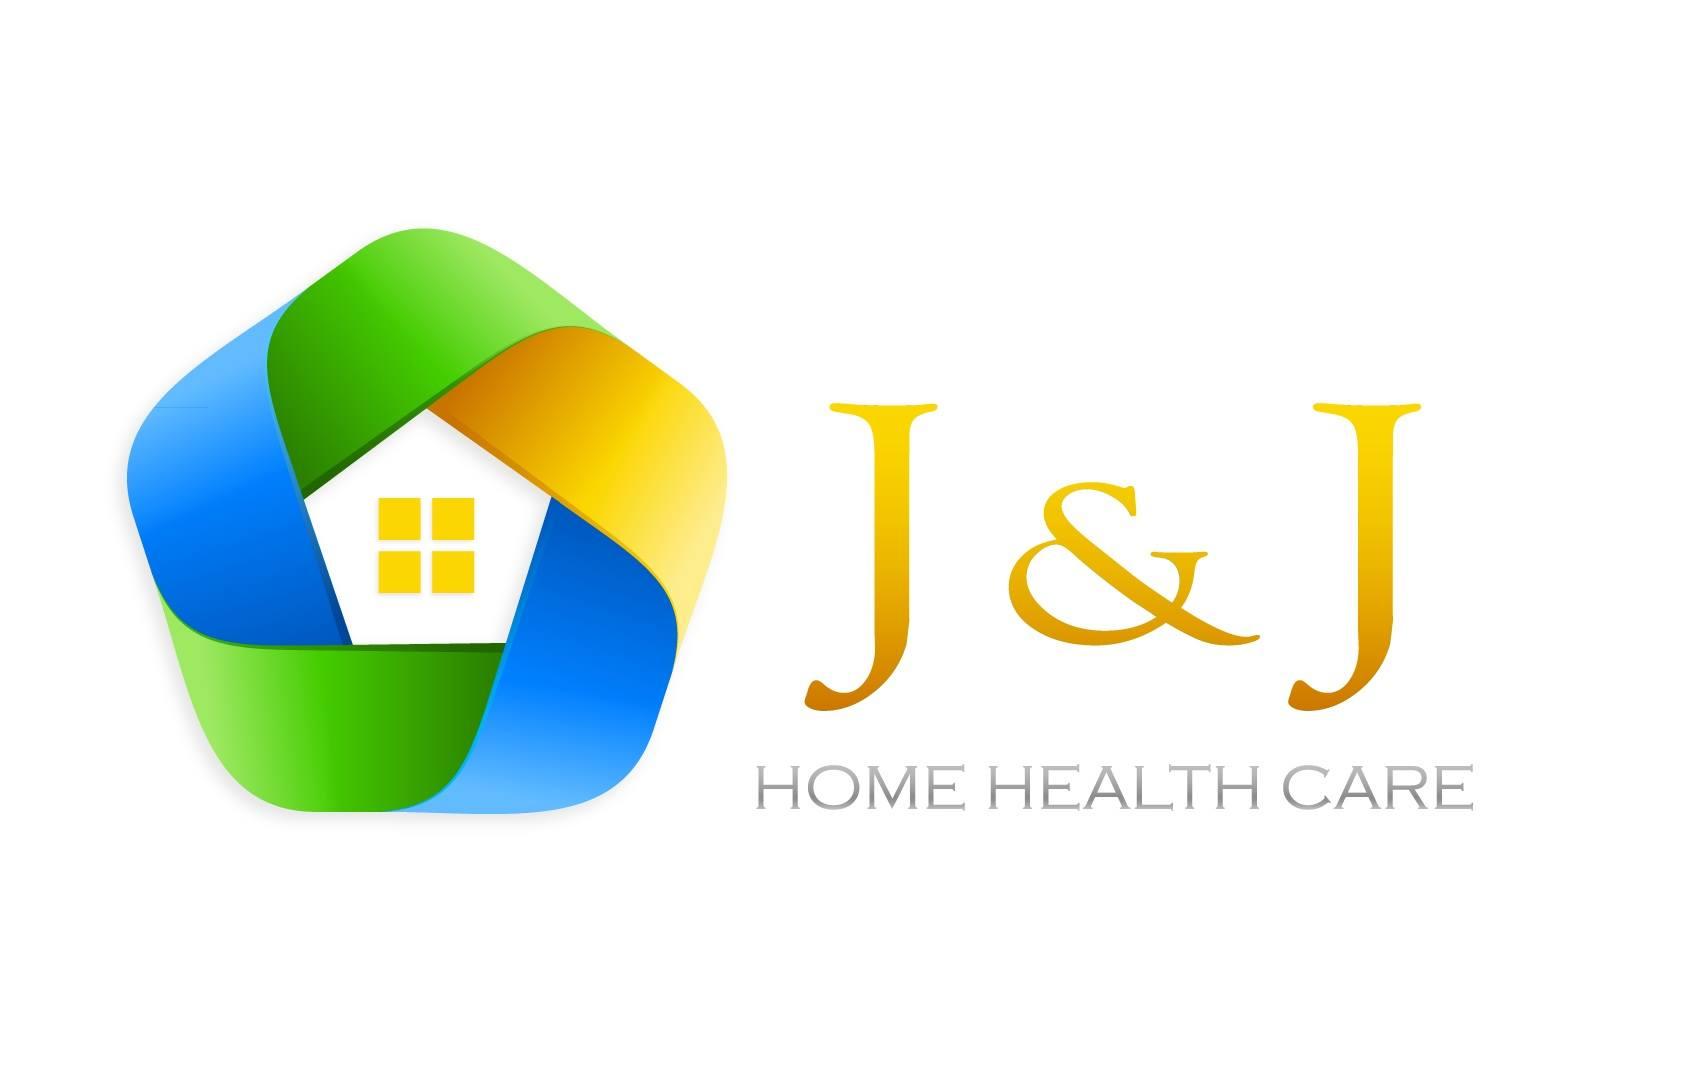 J &J Home Health Care